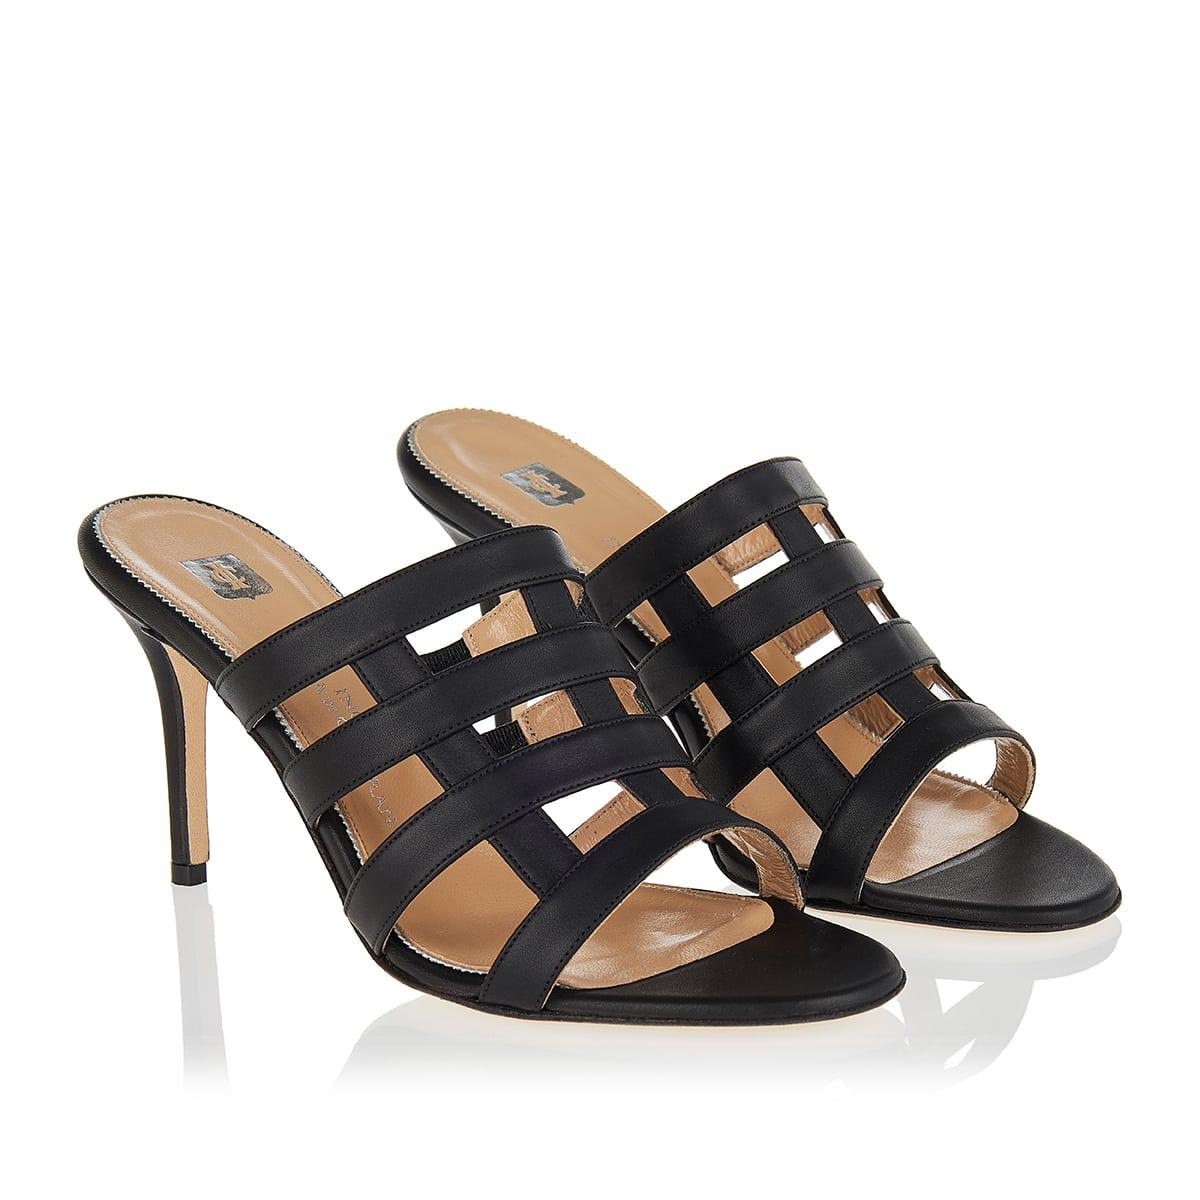 Clara Rosa leather mules